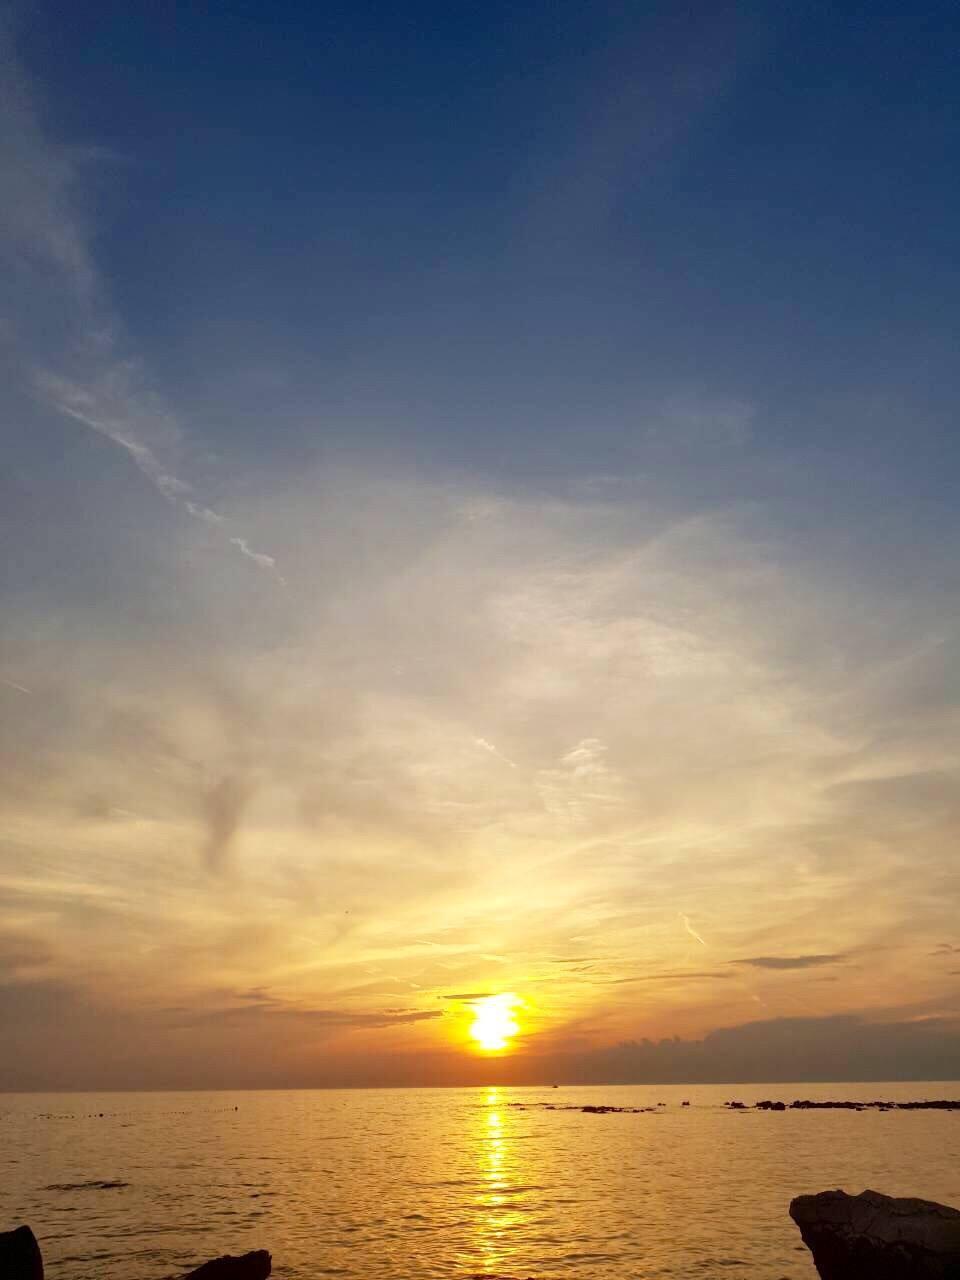 Stunning sunset at Stella Maris laguna in Umag.. Can't wait to play  @SeaStarFestival here tomorrow! https://t.co/Cm7rKX1aLp